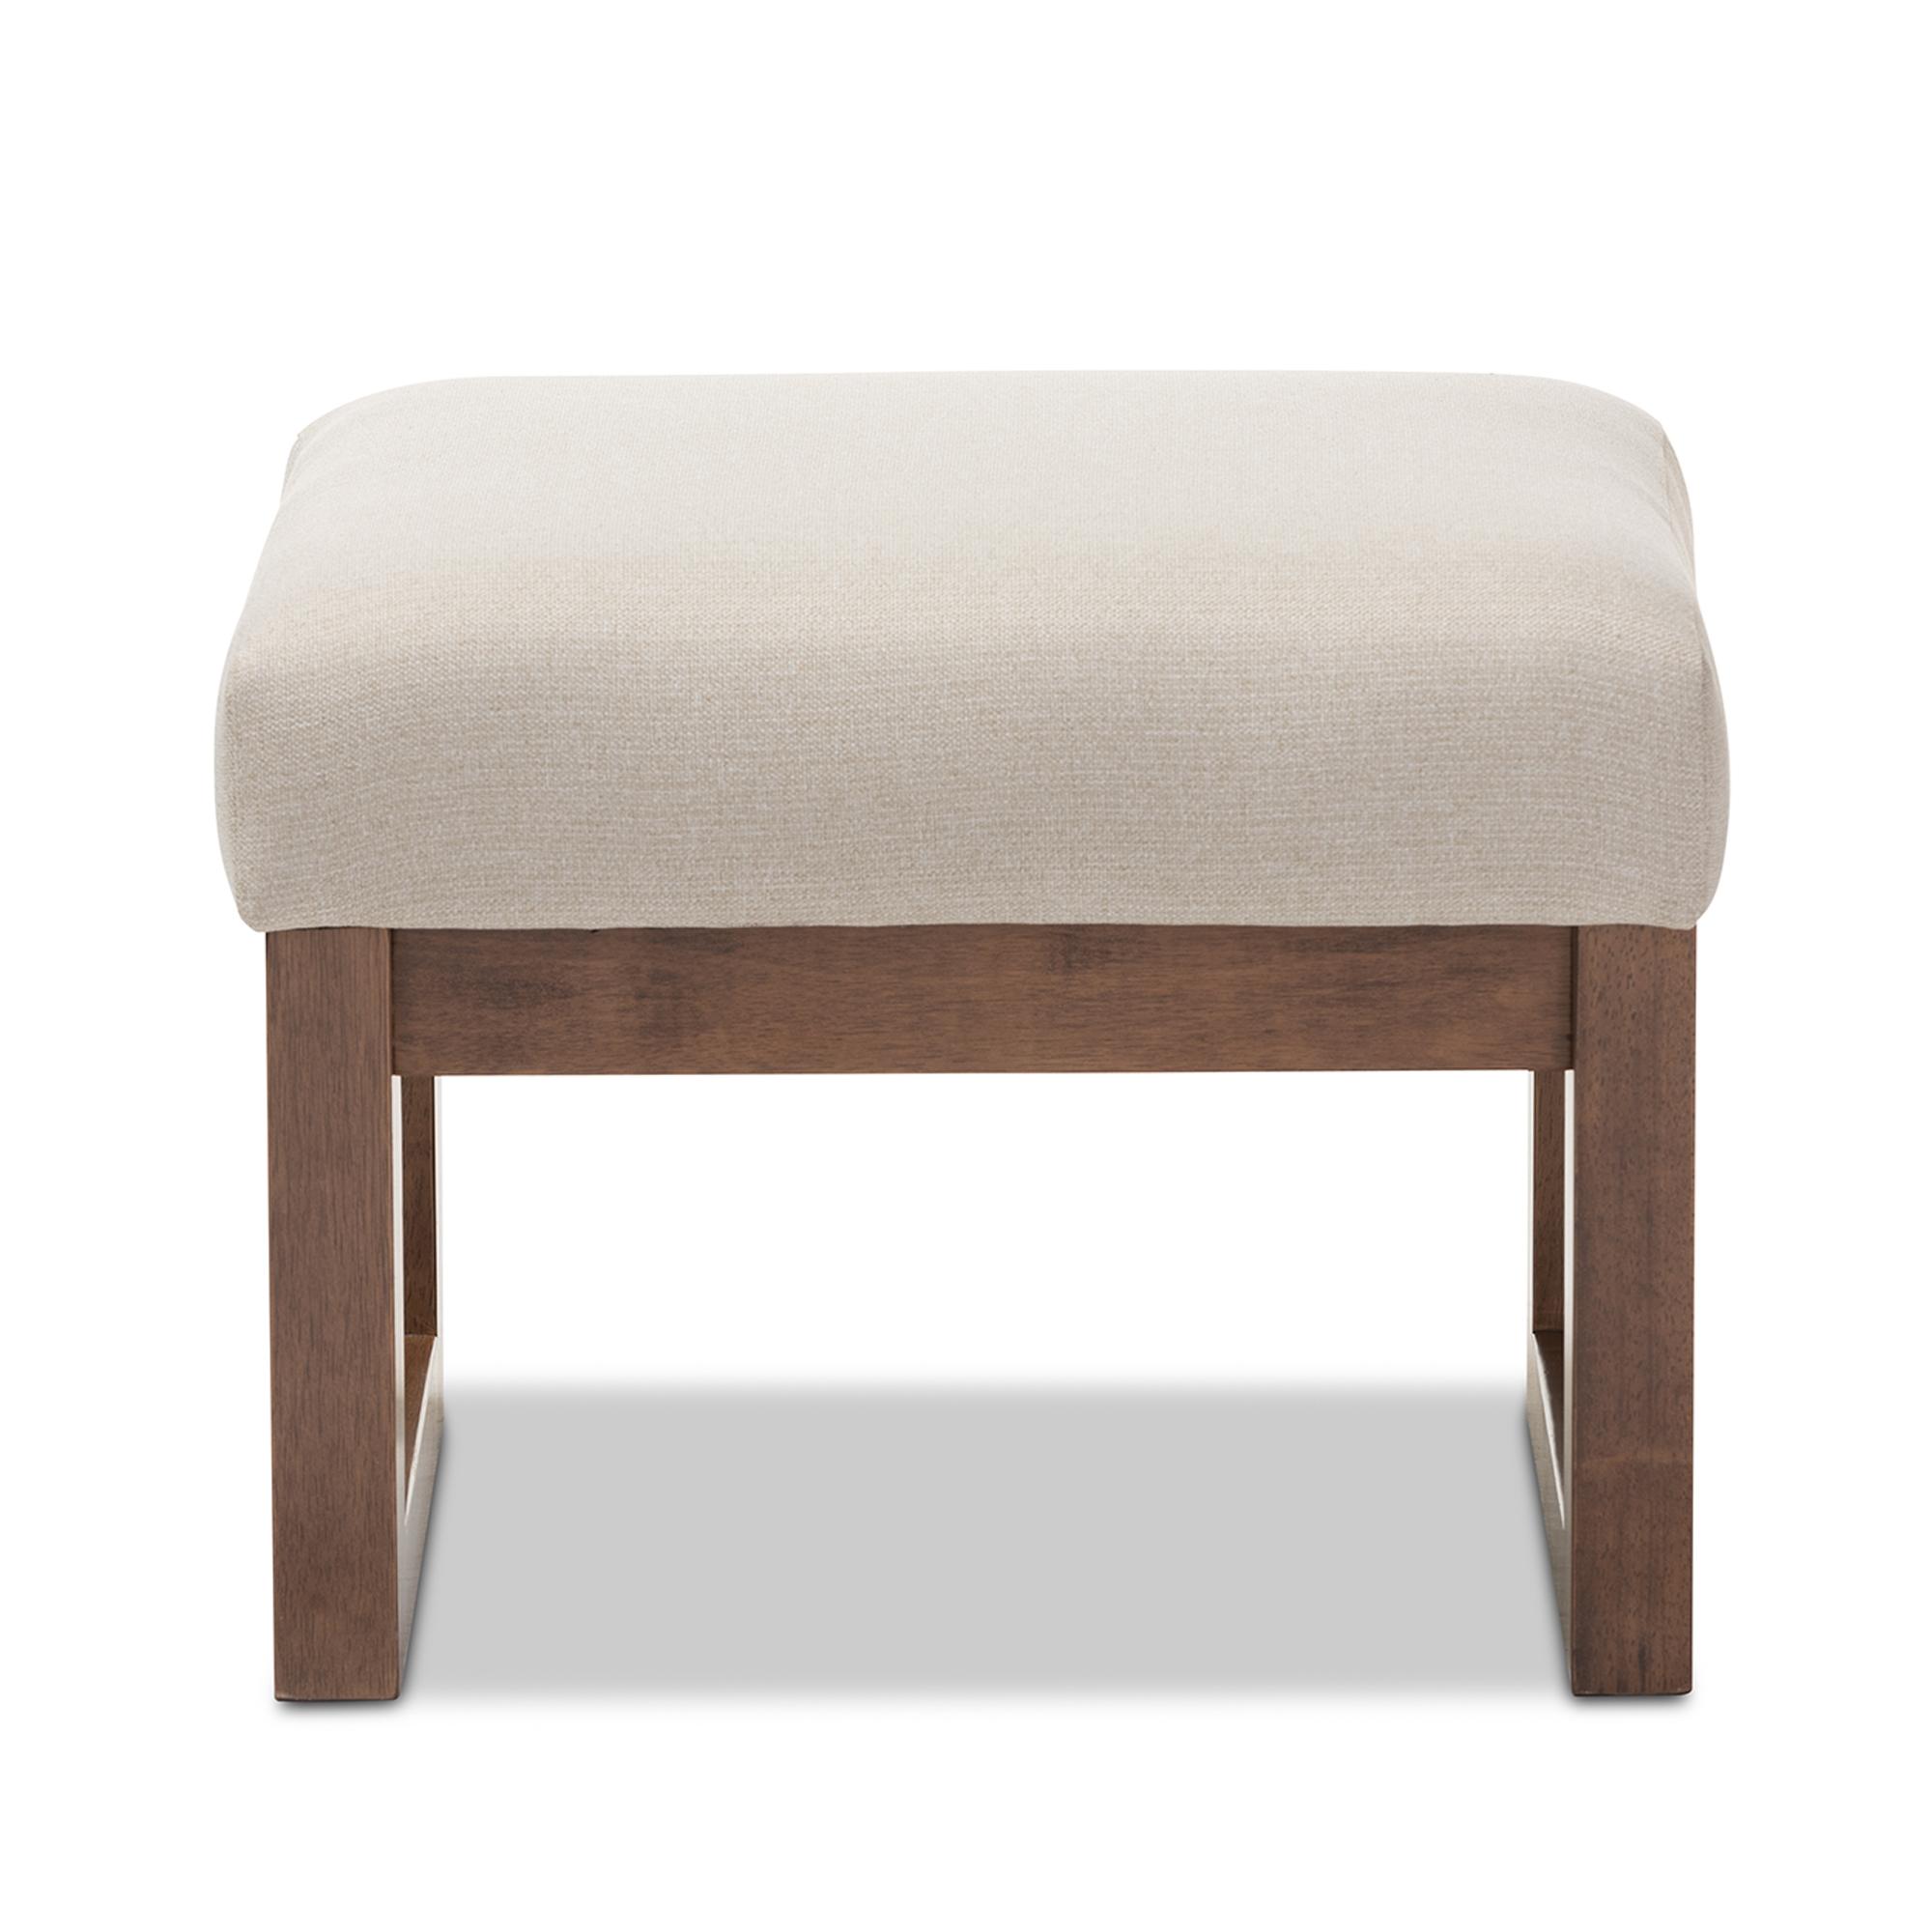 Baxton Studio Yashiya Mid Century Retro Modern Light Beige Fabric  Upholstered Ottoman Stool Affordable Modern